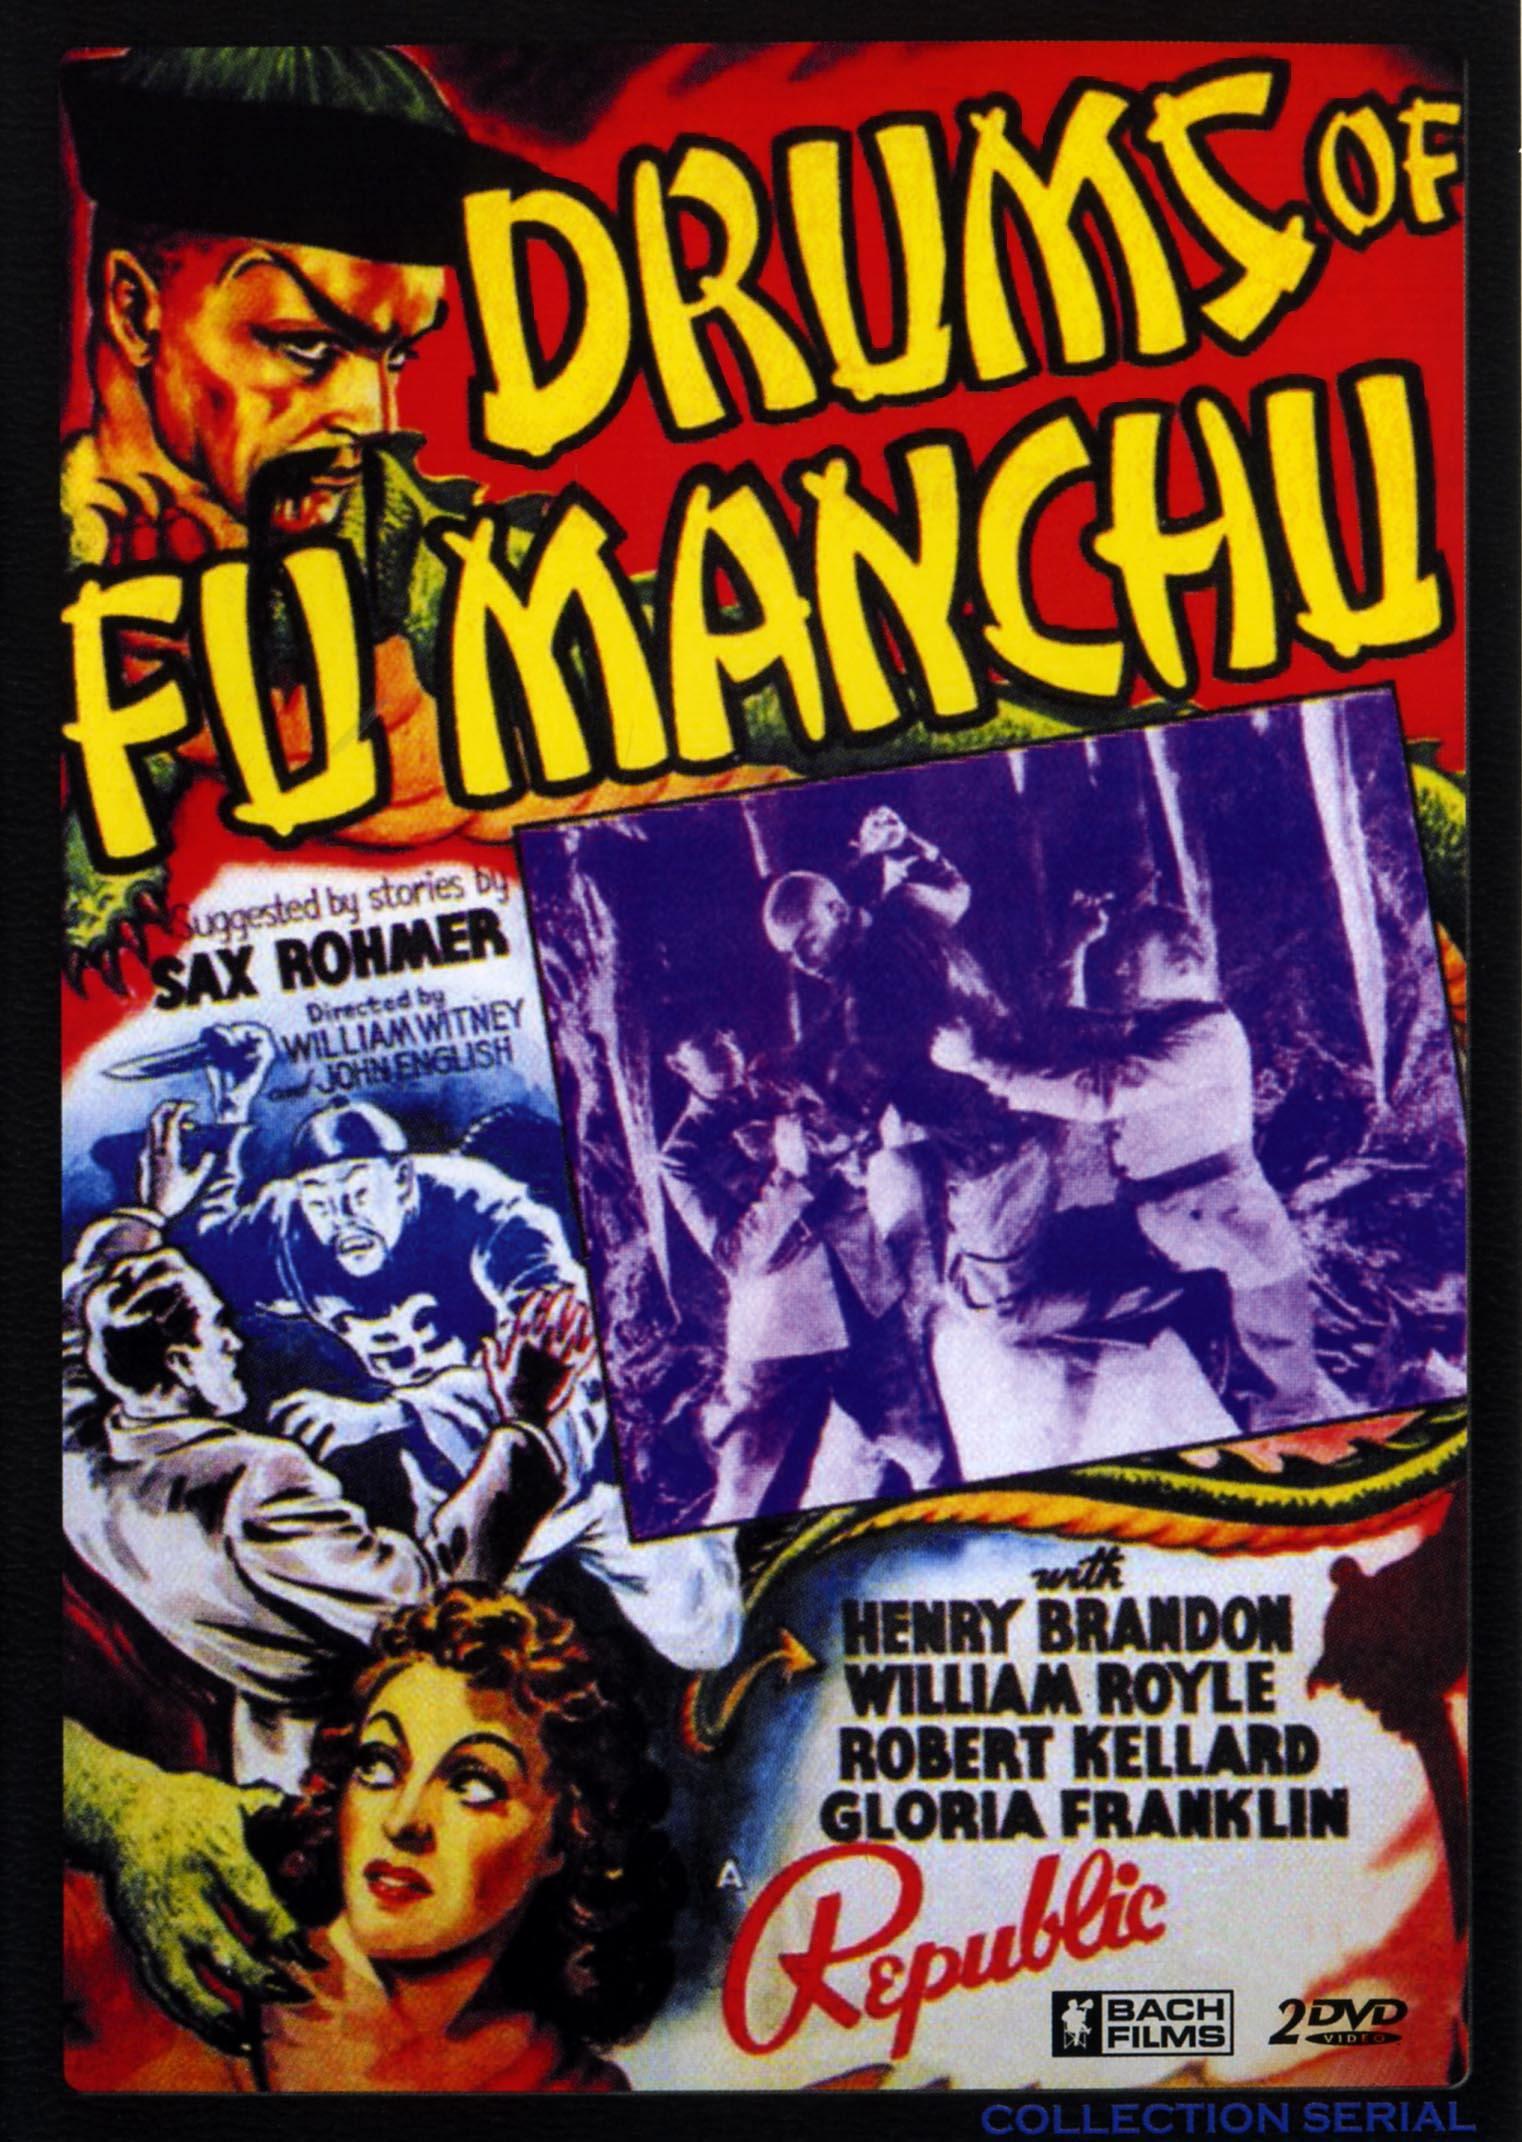 Les tambours de fu manchu-2dvd  collection serial